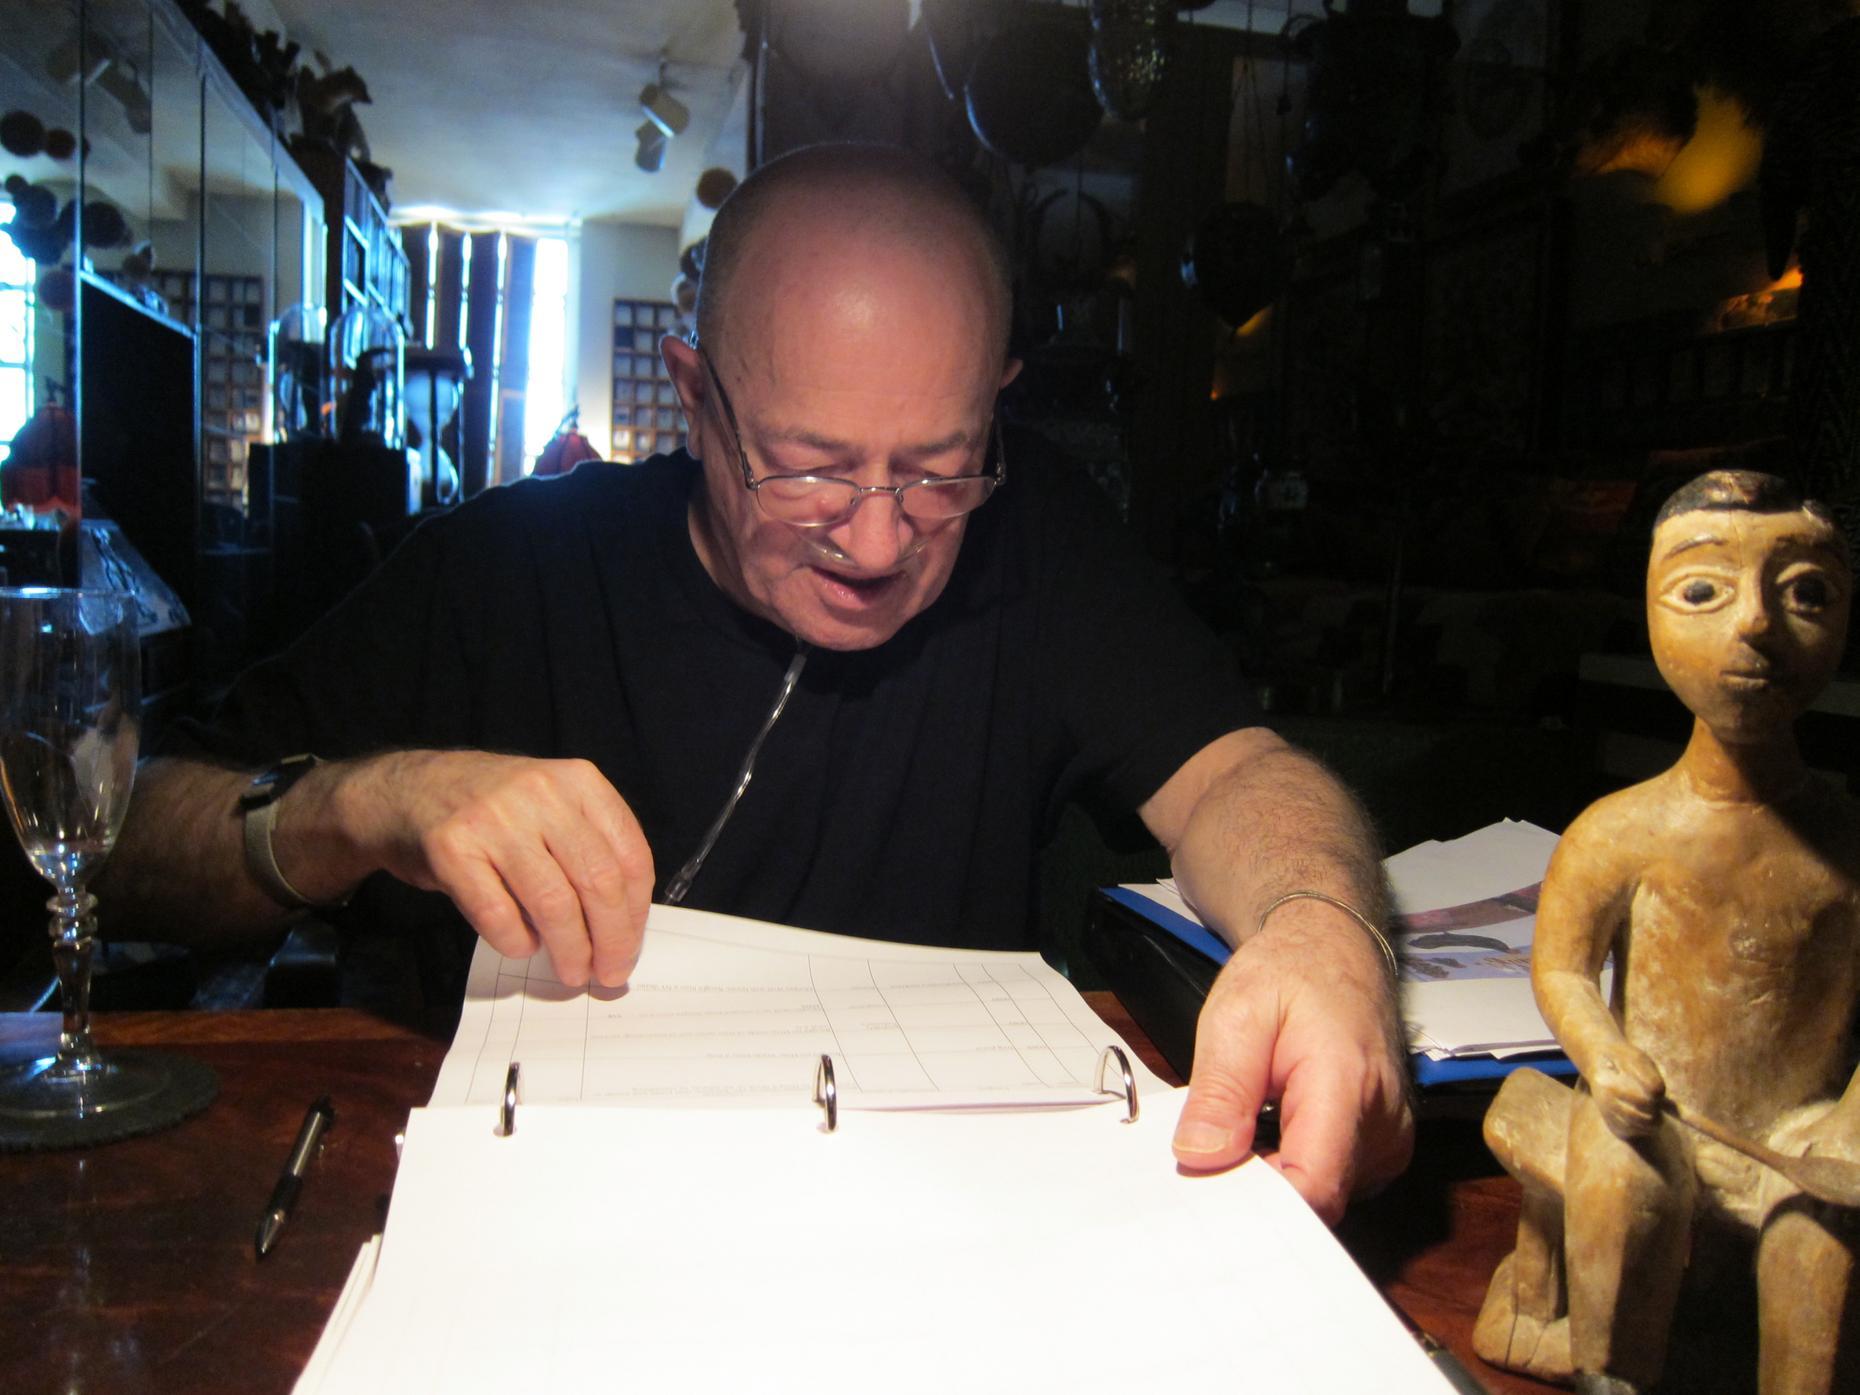 Barton cataloging items in his apartment